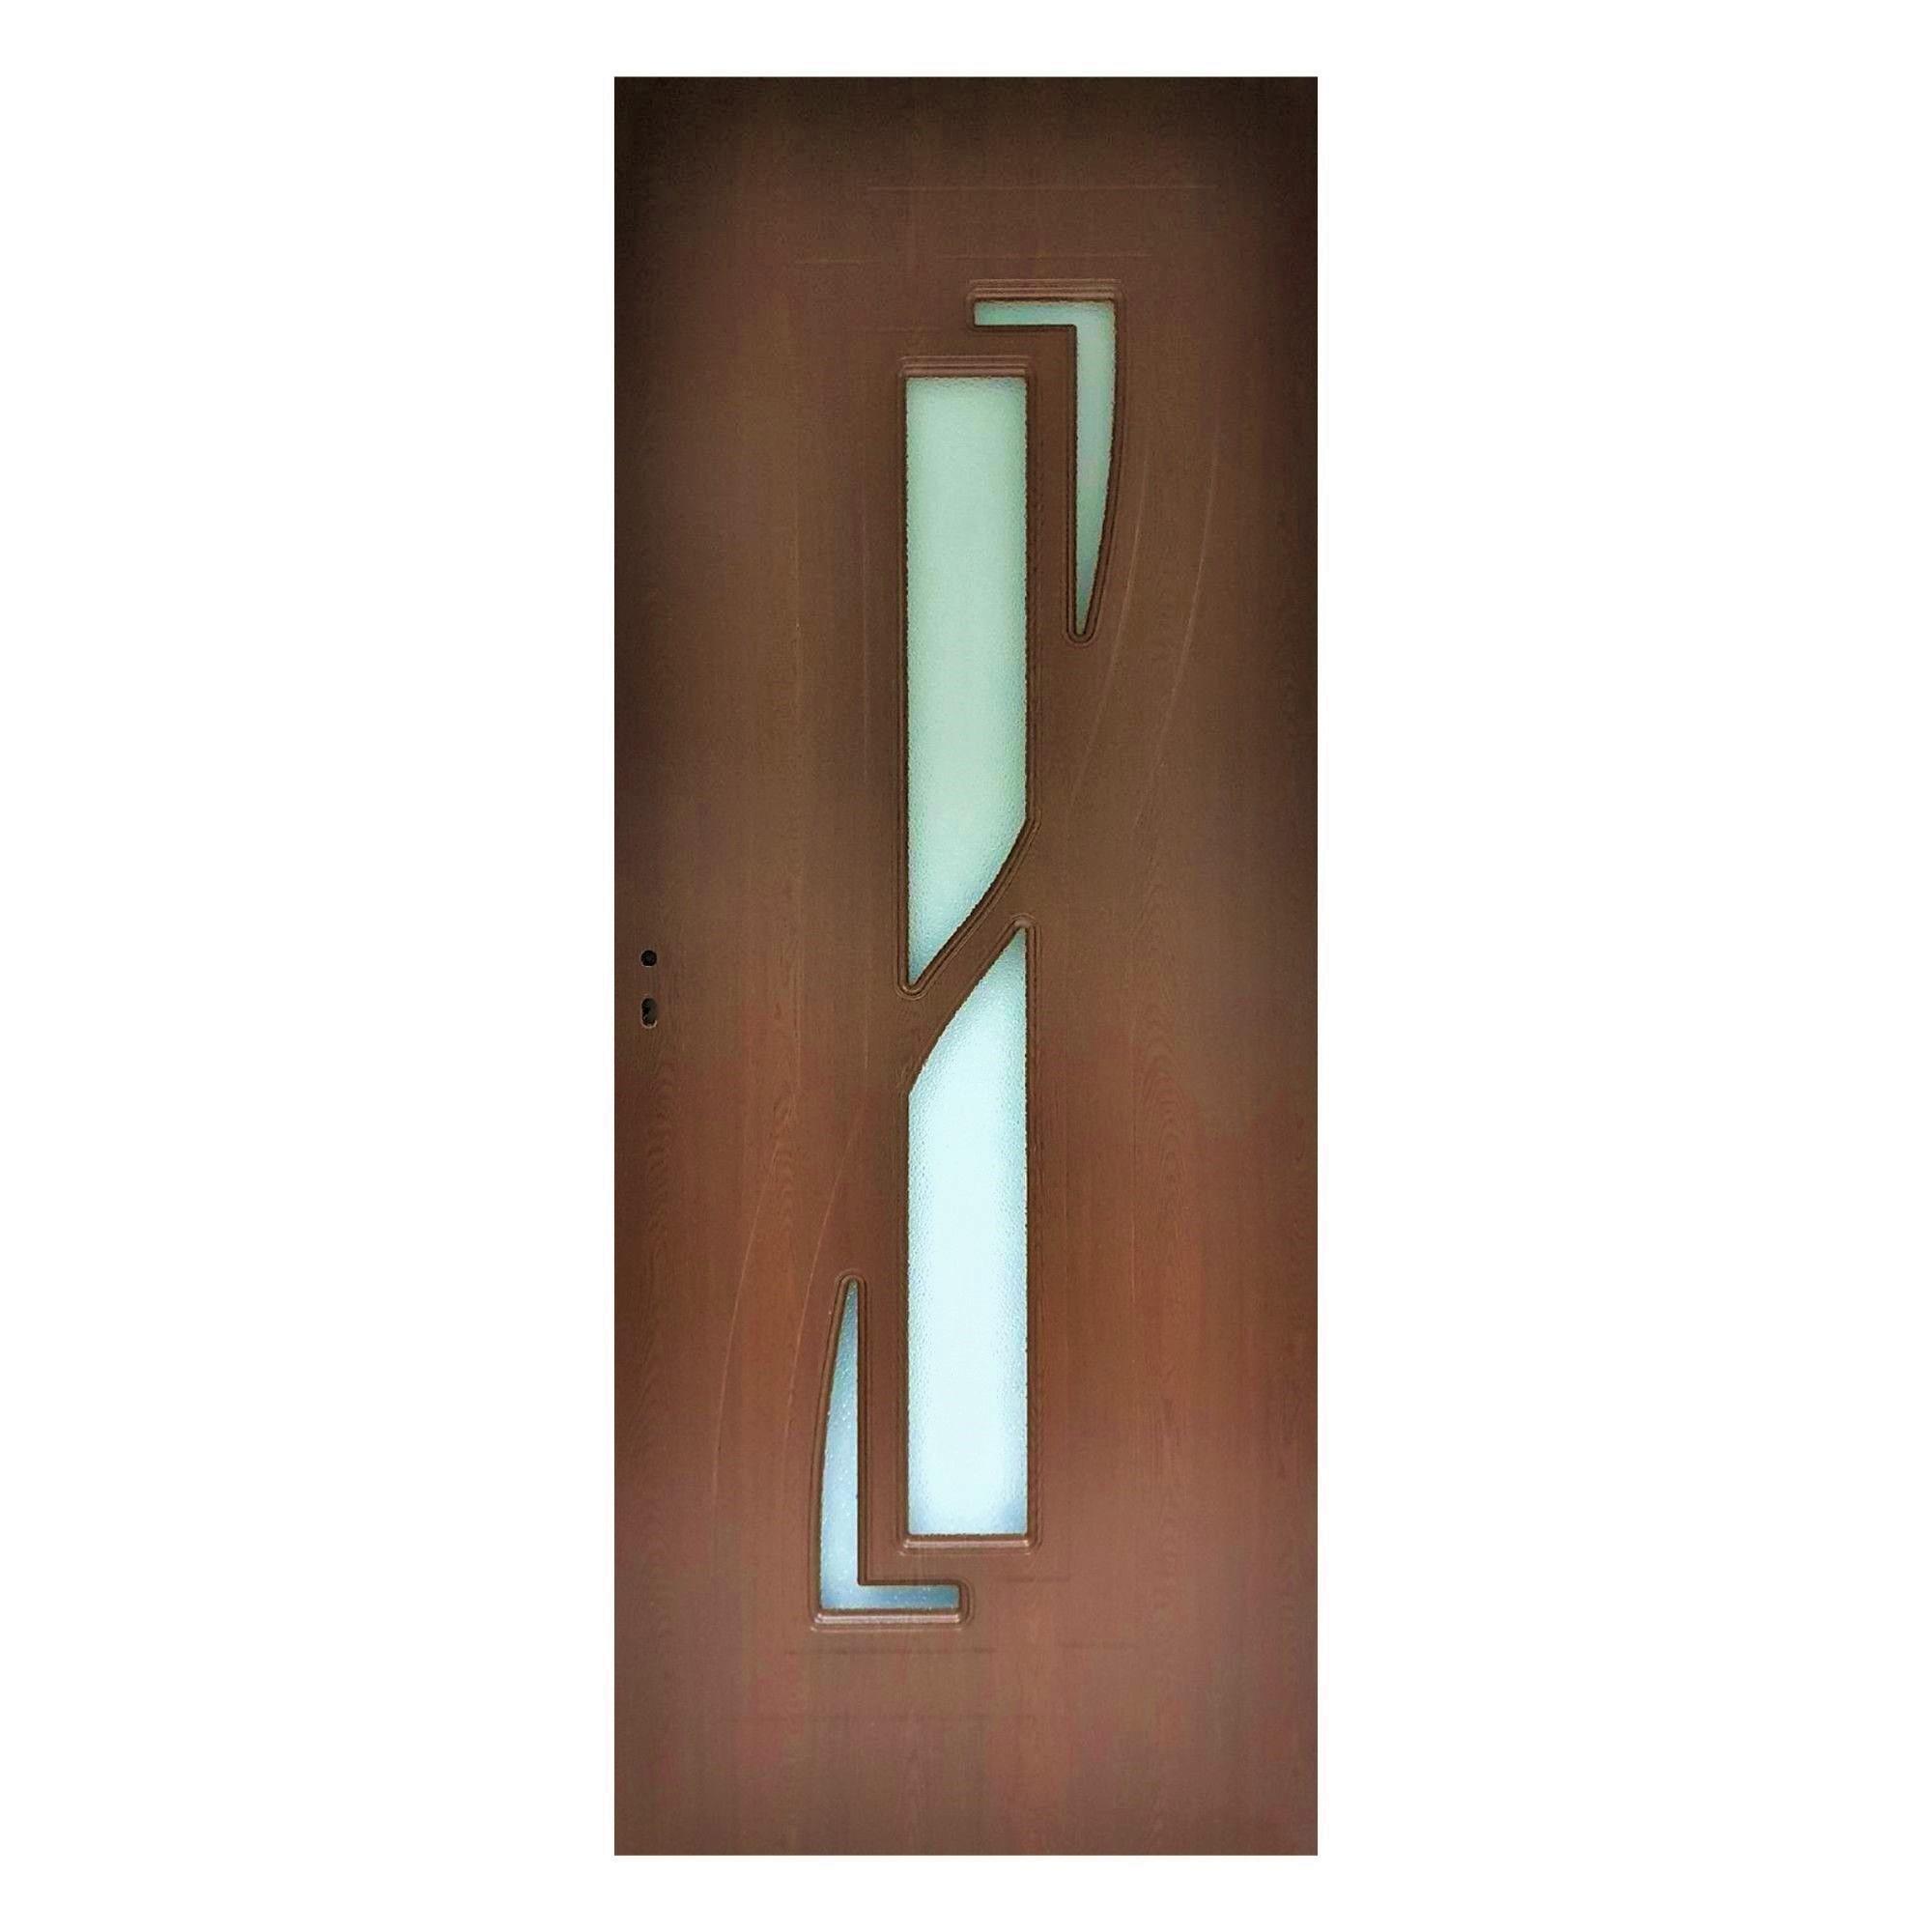 Usa interior cu geam Pamate M042, stejar auriu, 203 x 60 x 3,5 cm + toc 10 cm, reversibila imagine 2021 mathaus